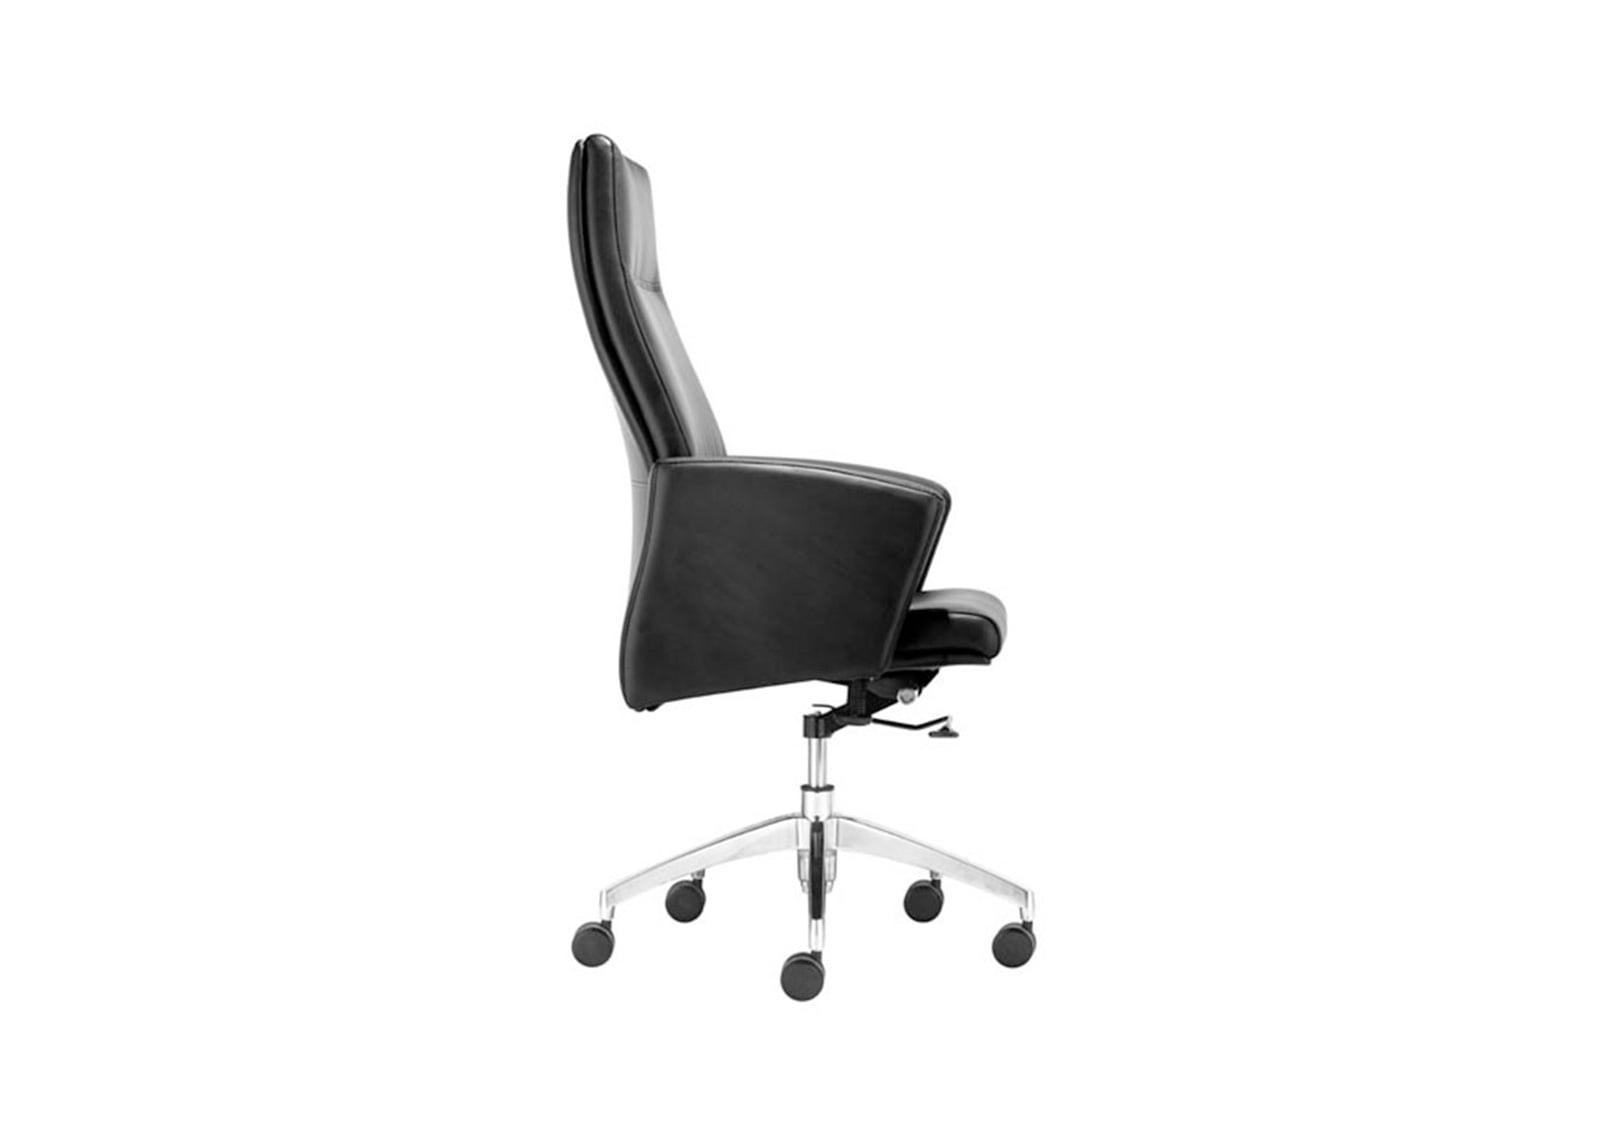 Chieftain High Back Office Chair Black Furnishplus